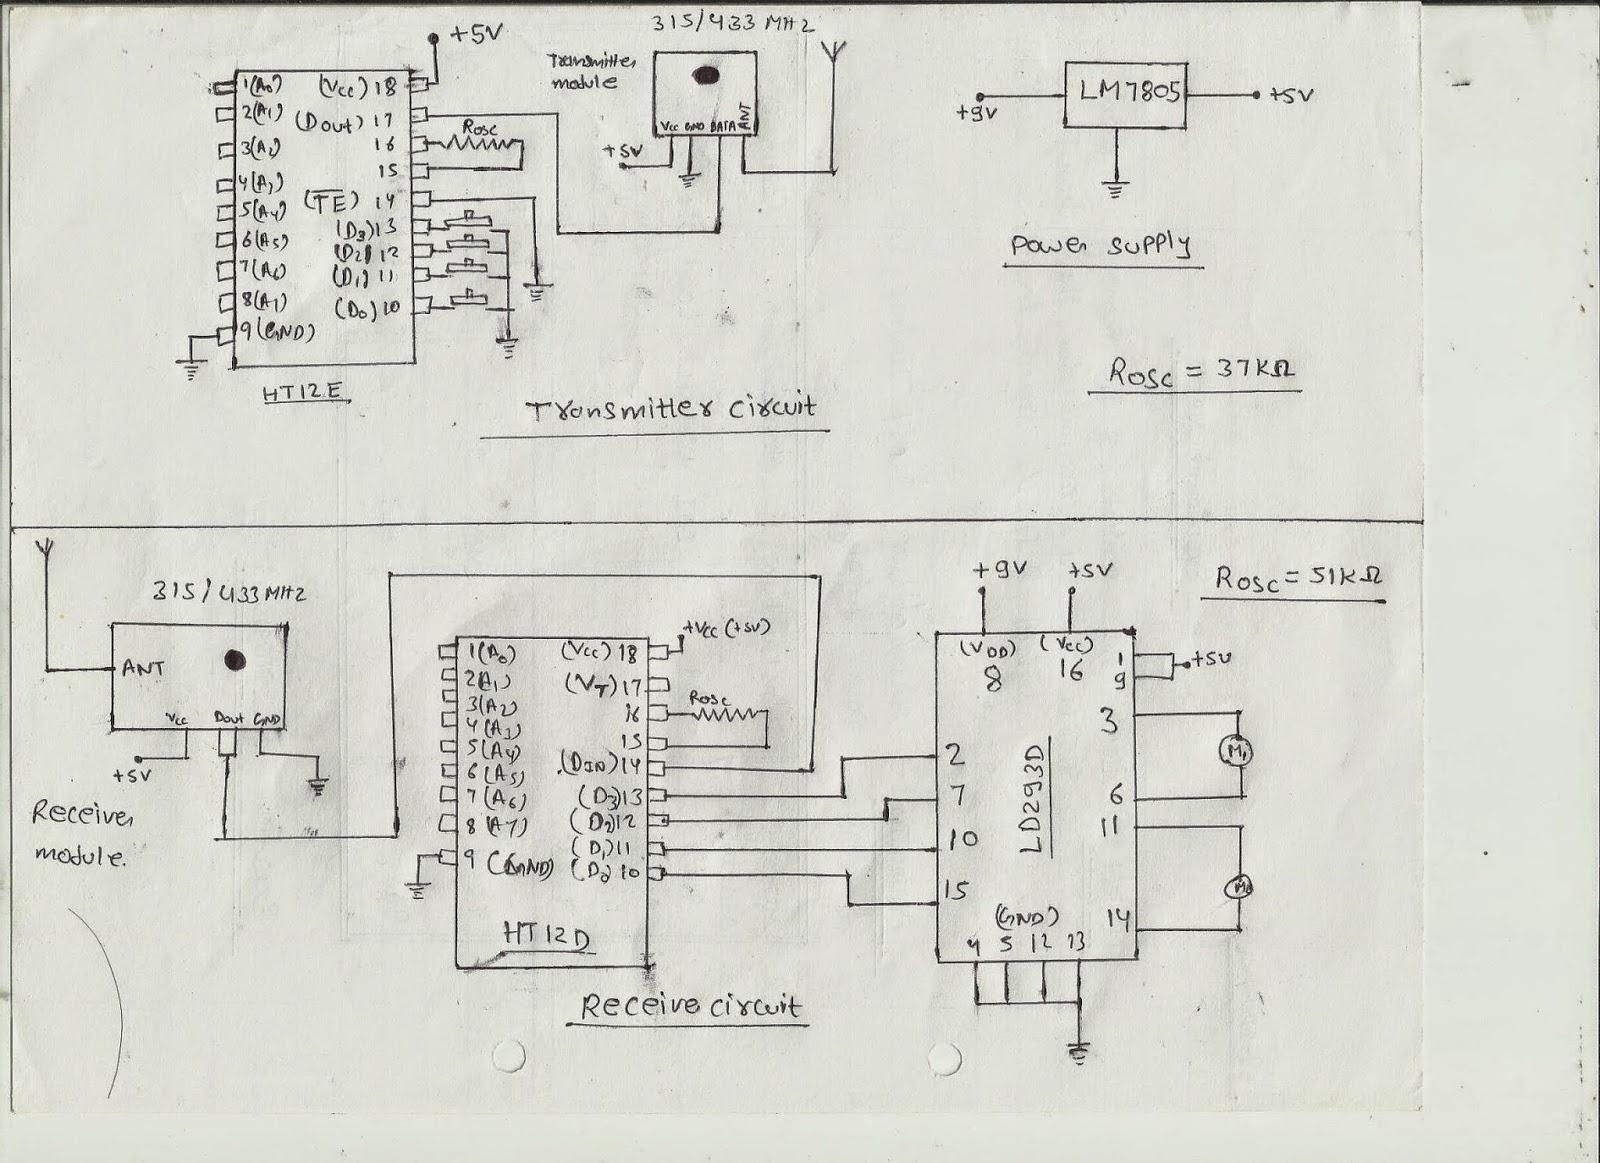 Car Stereo Circuit Board Diagram Circuit And Schematics Diagram $ Apktodownload